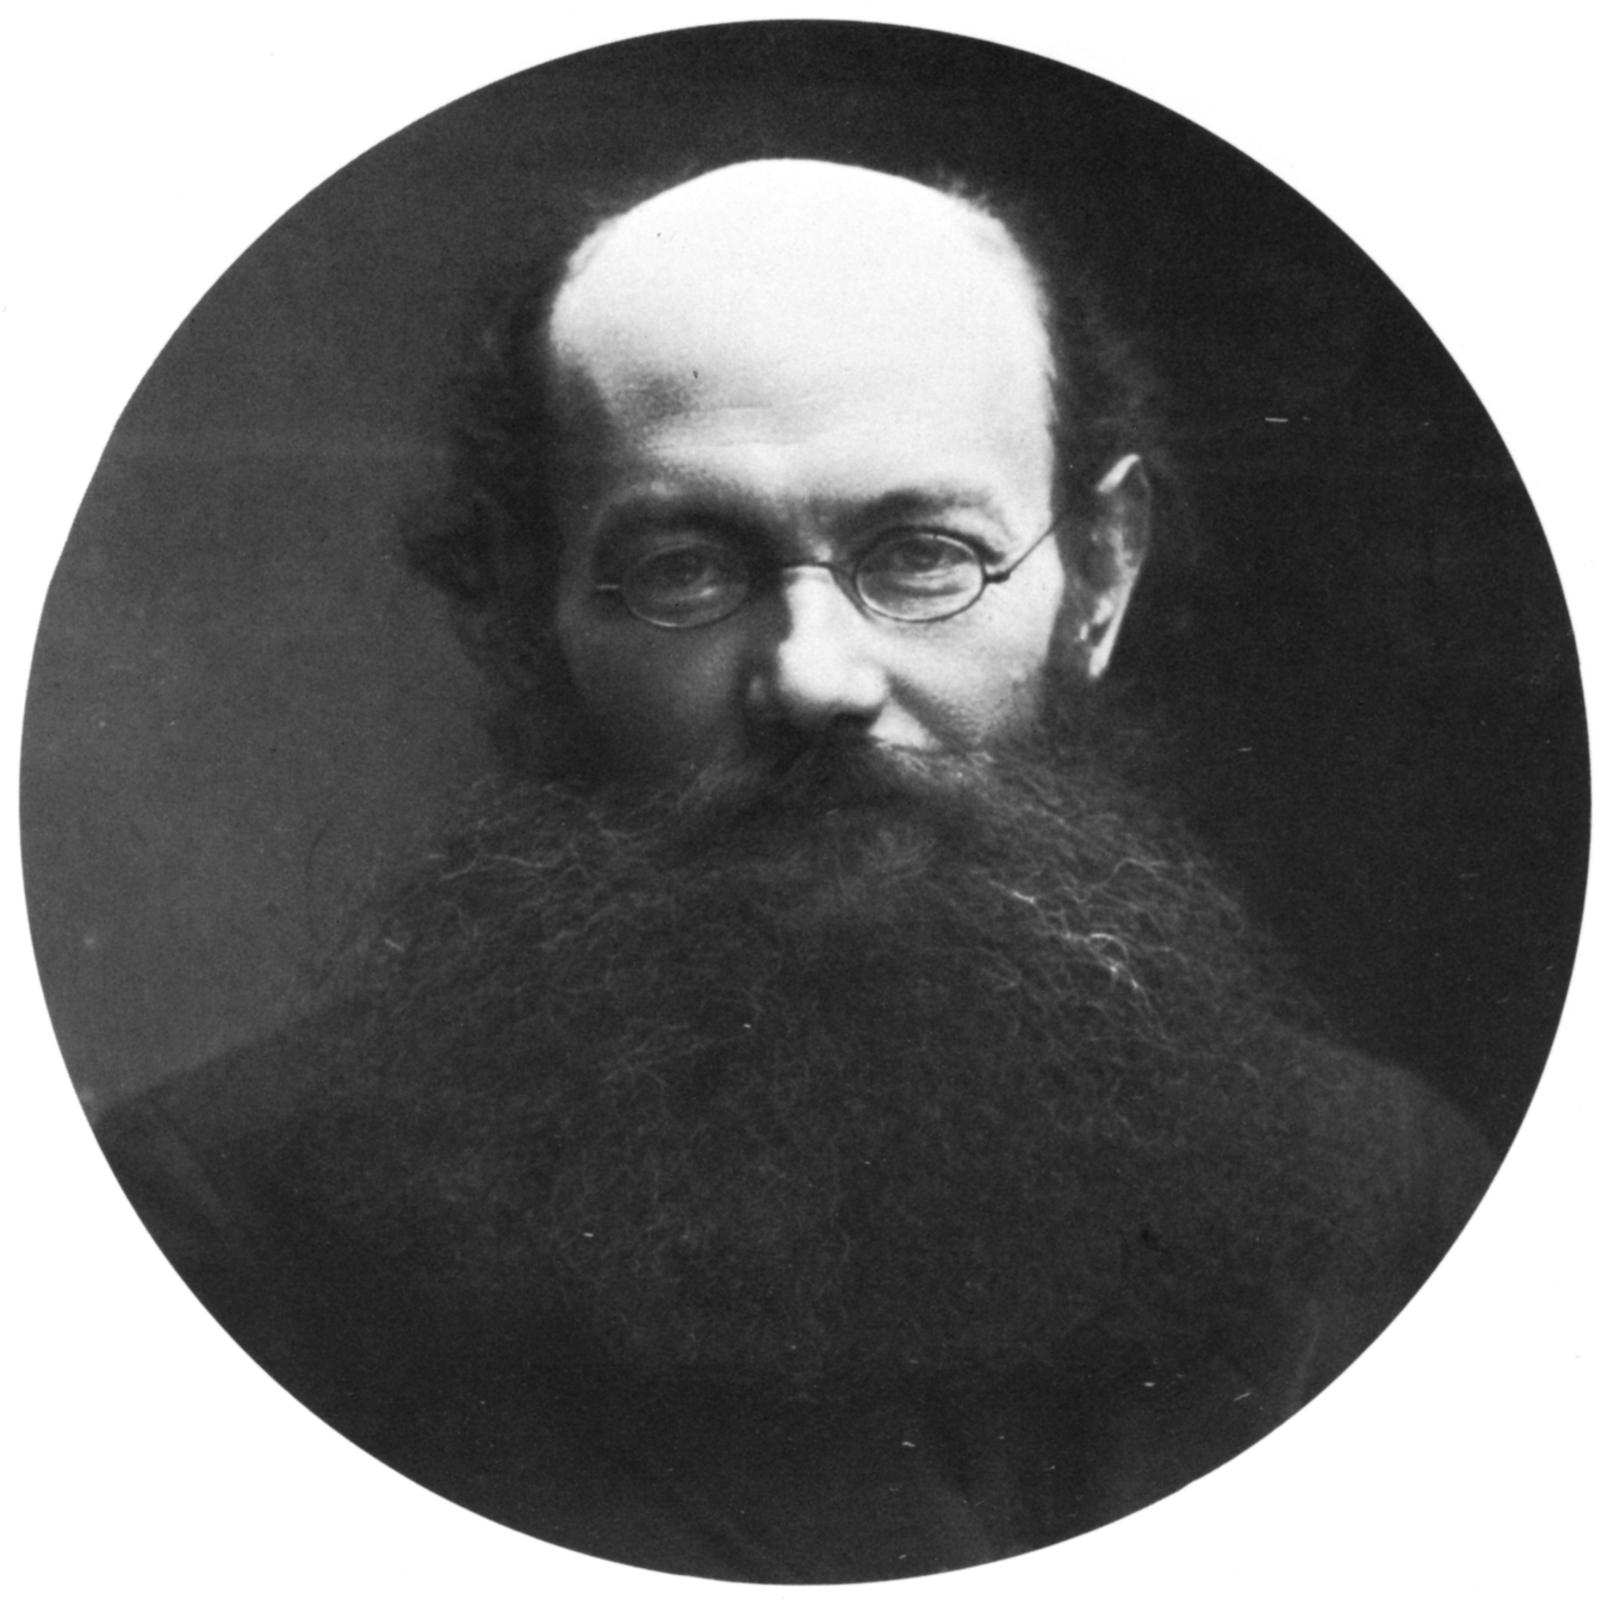 Depiction of Piotr Kropotkin